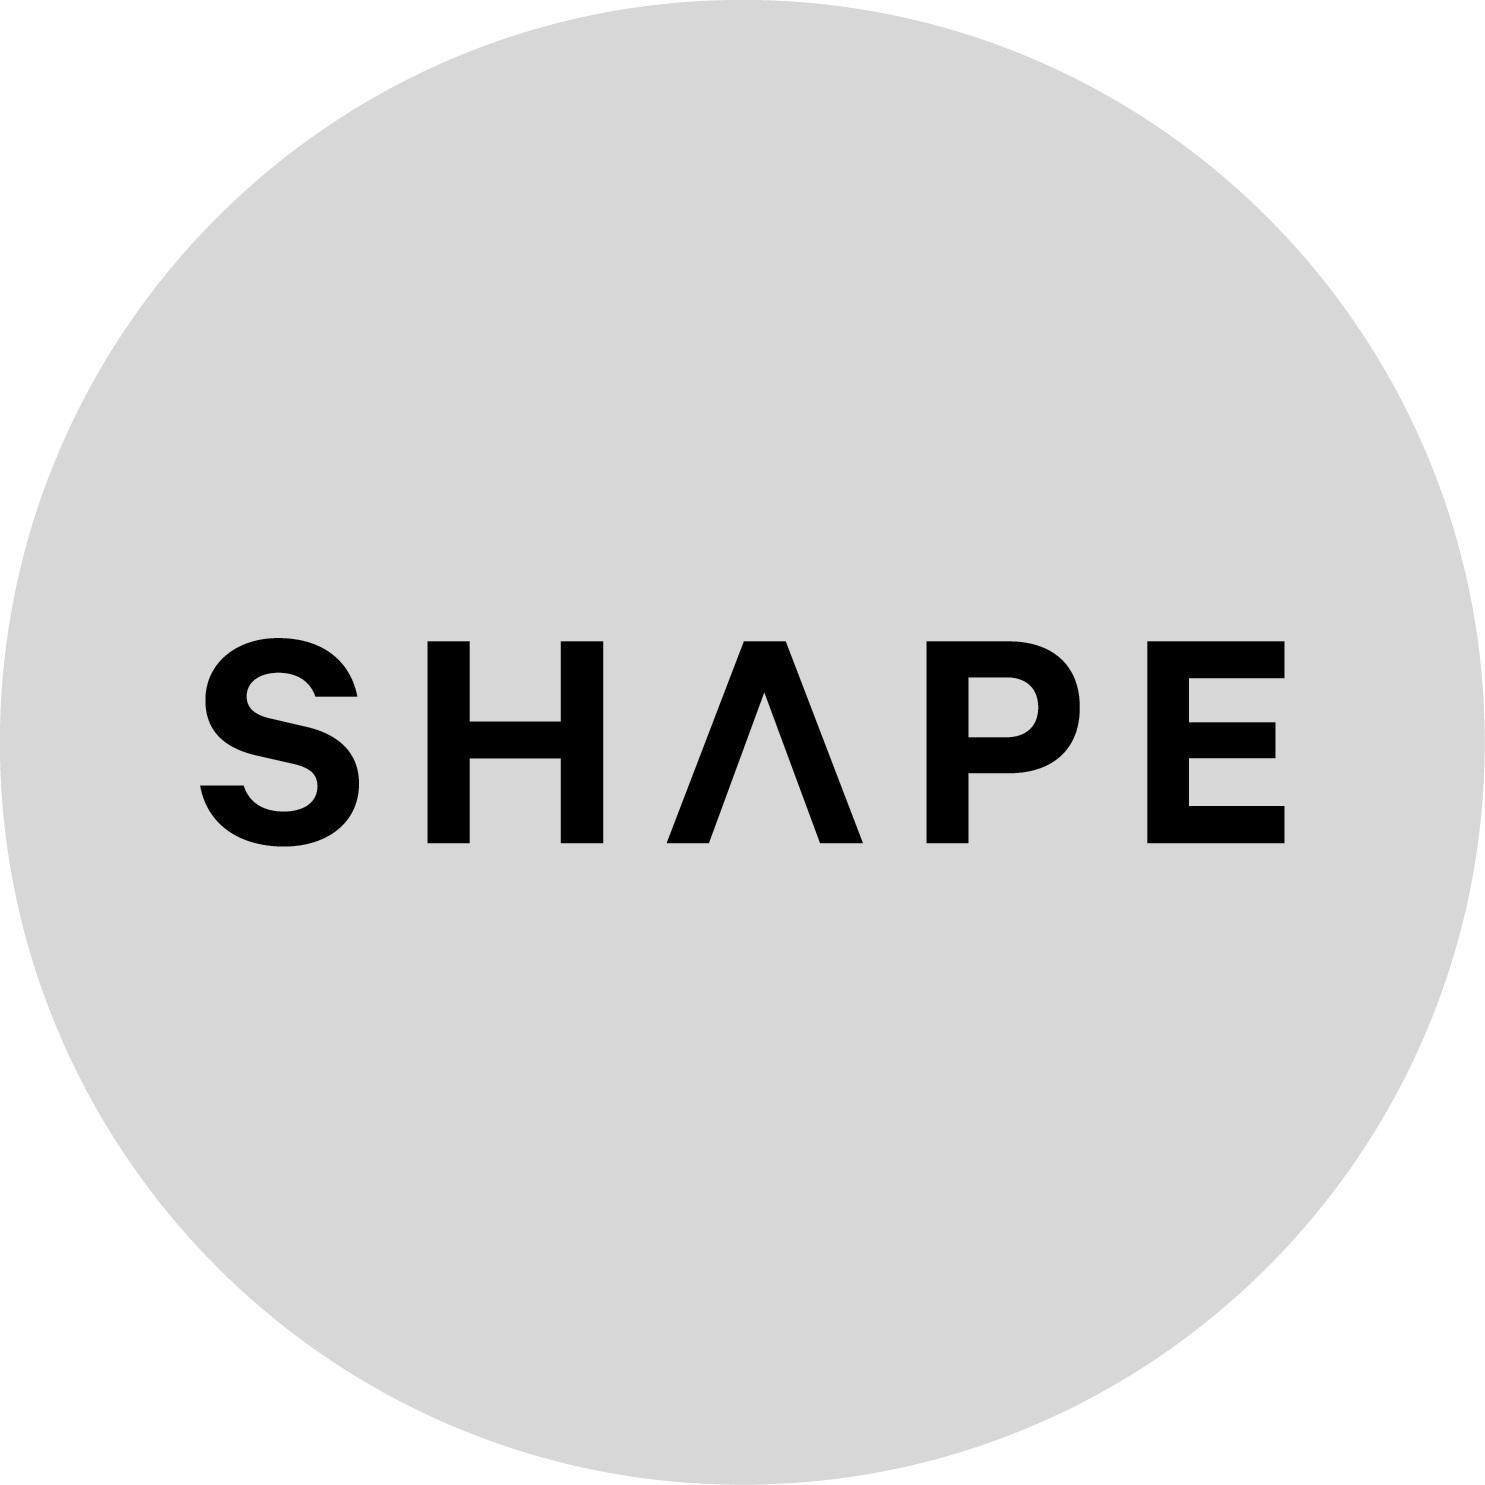 LOGO-shape.png